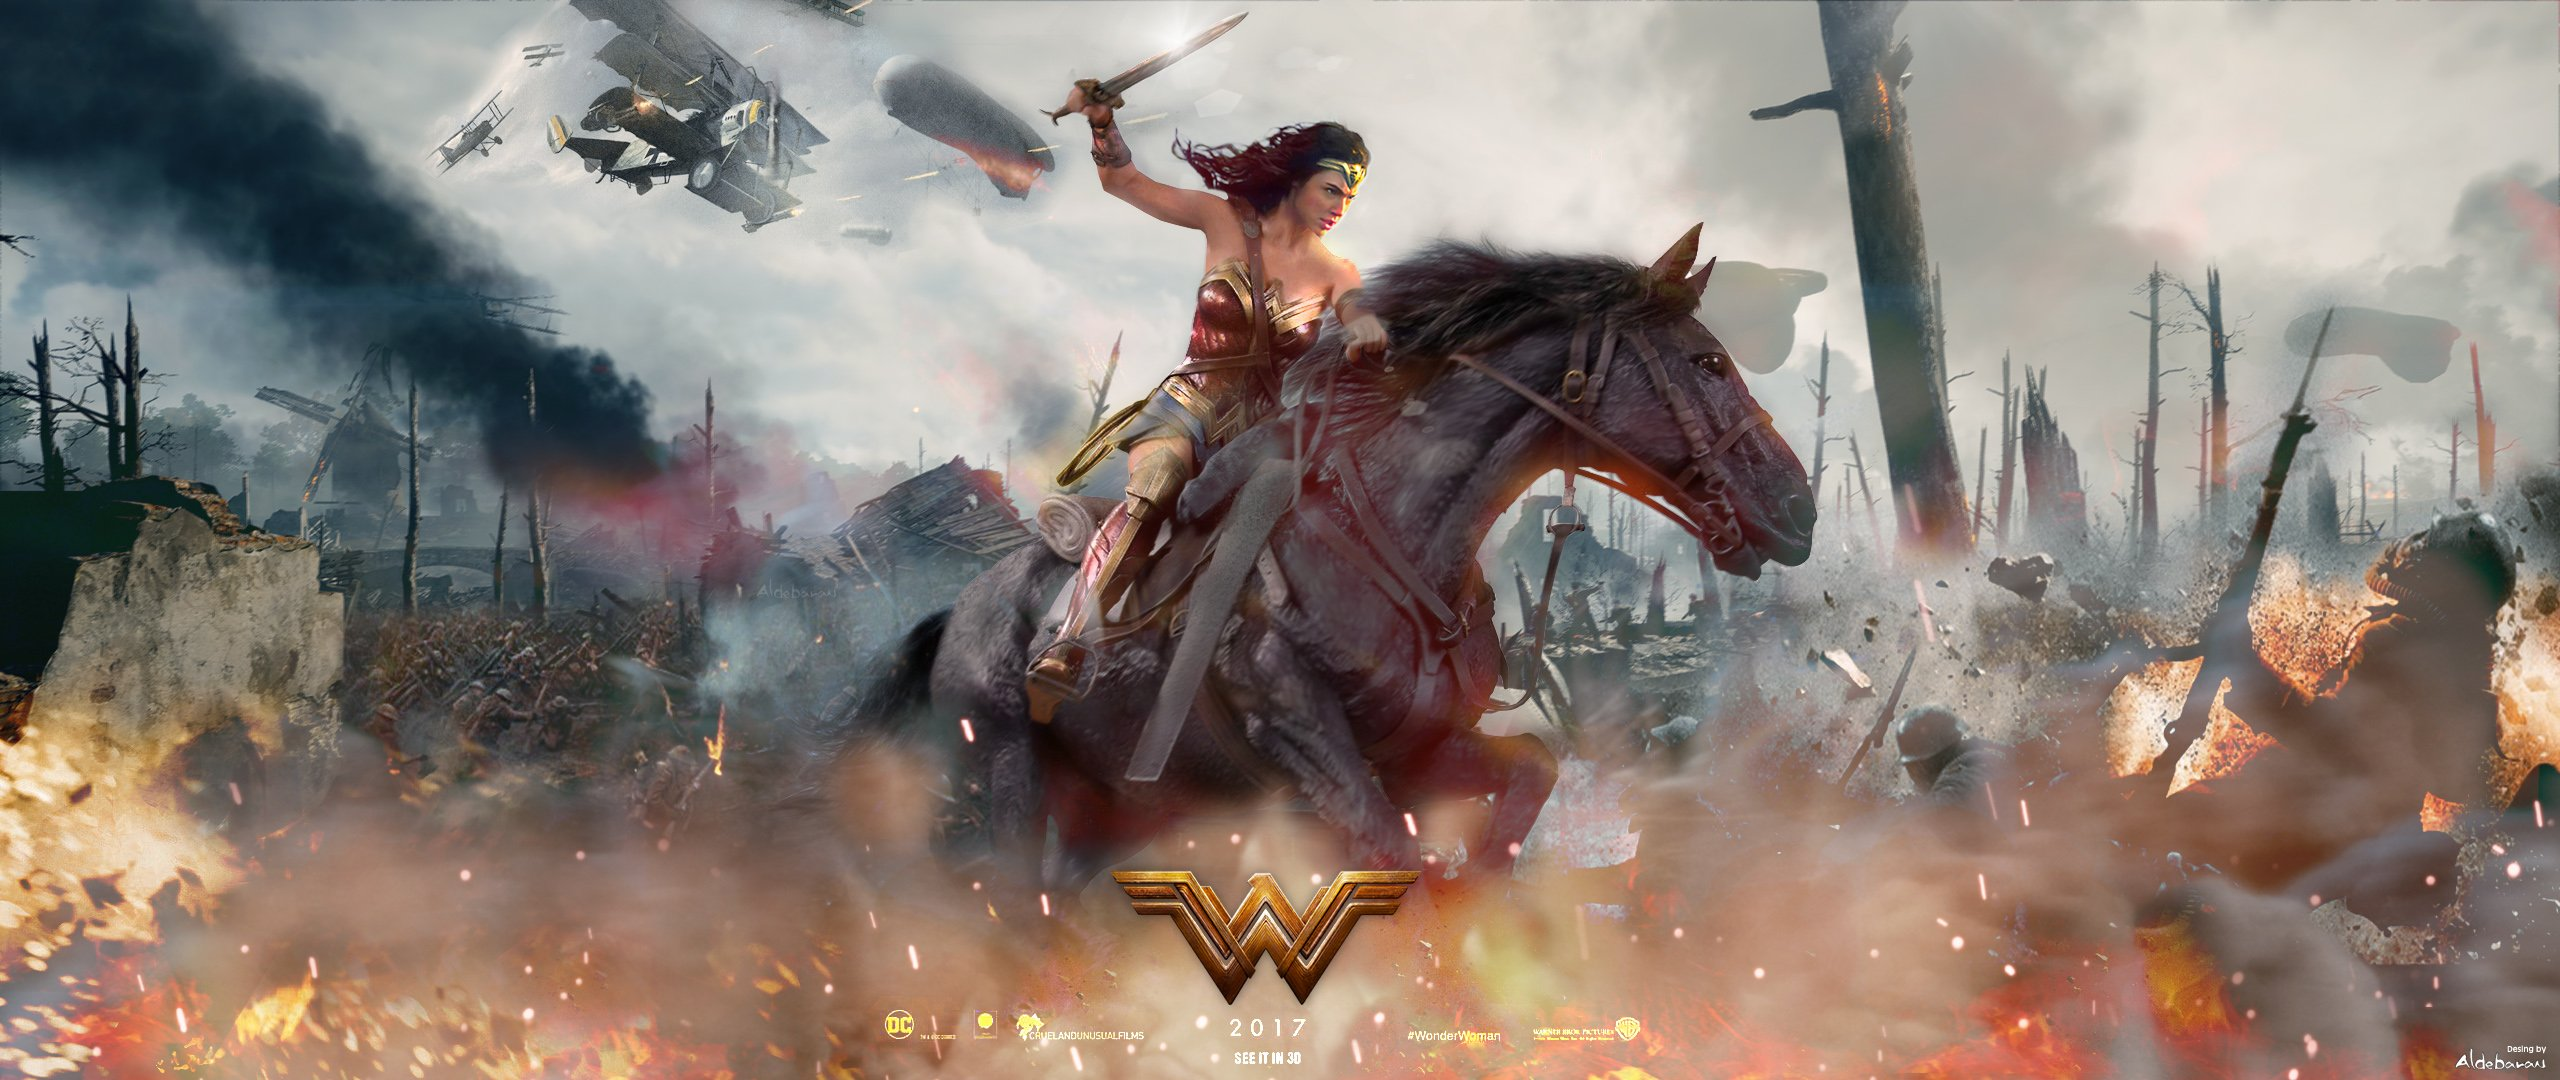 Wonder Woman Movie Wallpaper 1: 2017 Wonder Woman Movie Fan Art, HD Movies, 4k Wallpapers